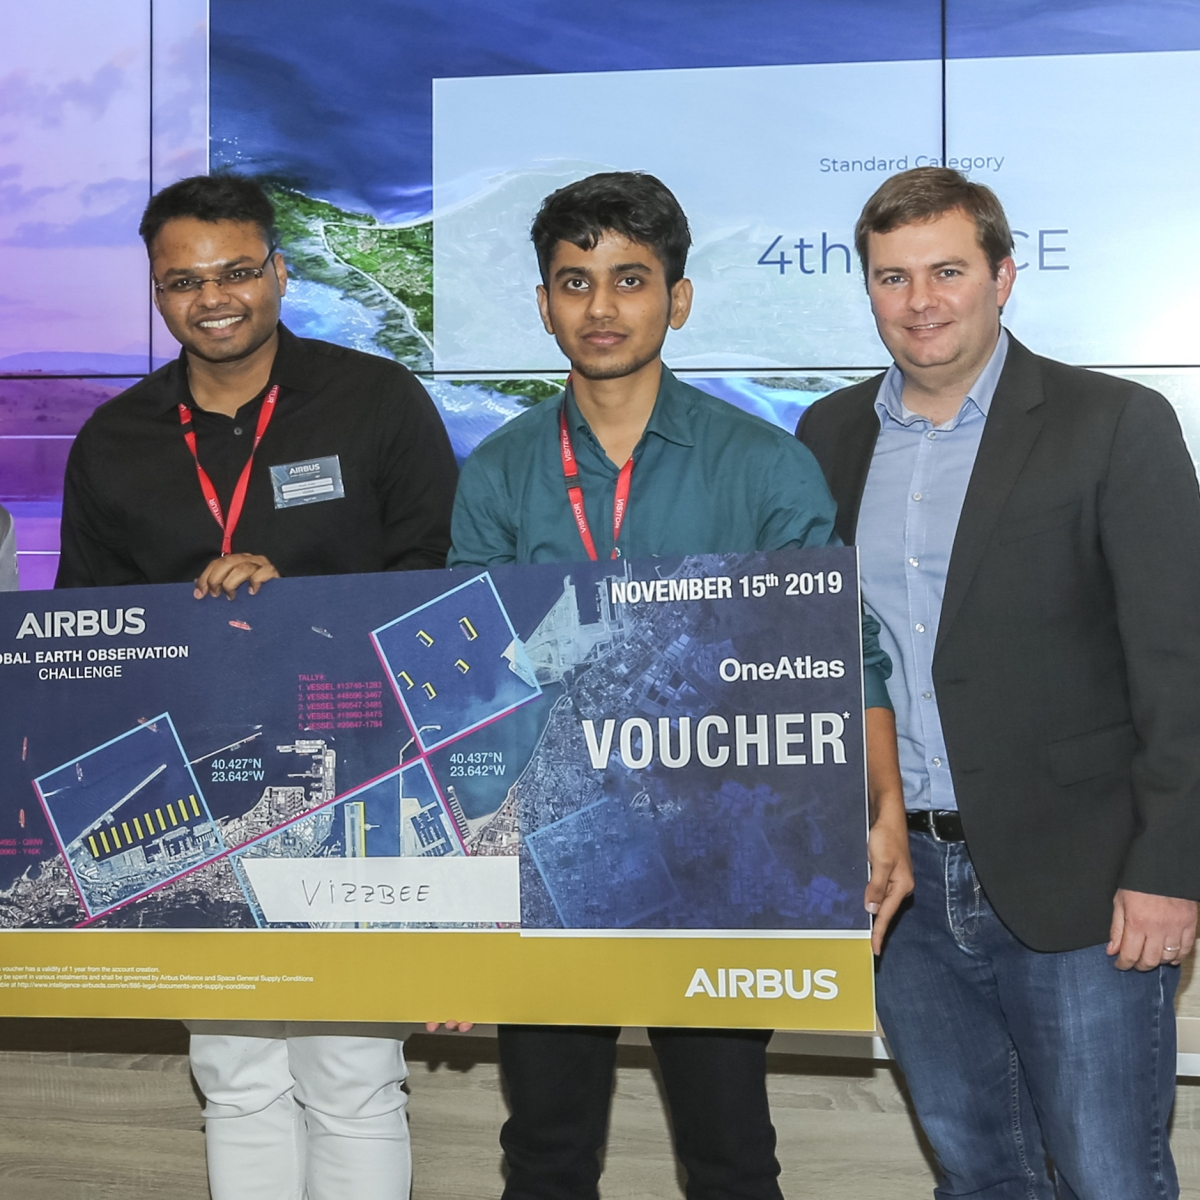 Bhopal: Start-ups entrepreneurs Vibhu & Ayush secure 4th rank in international contest